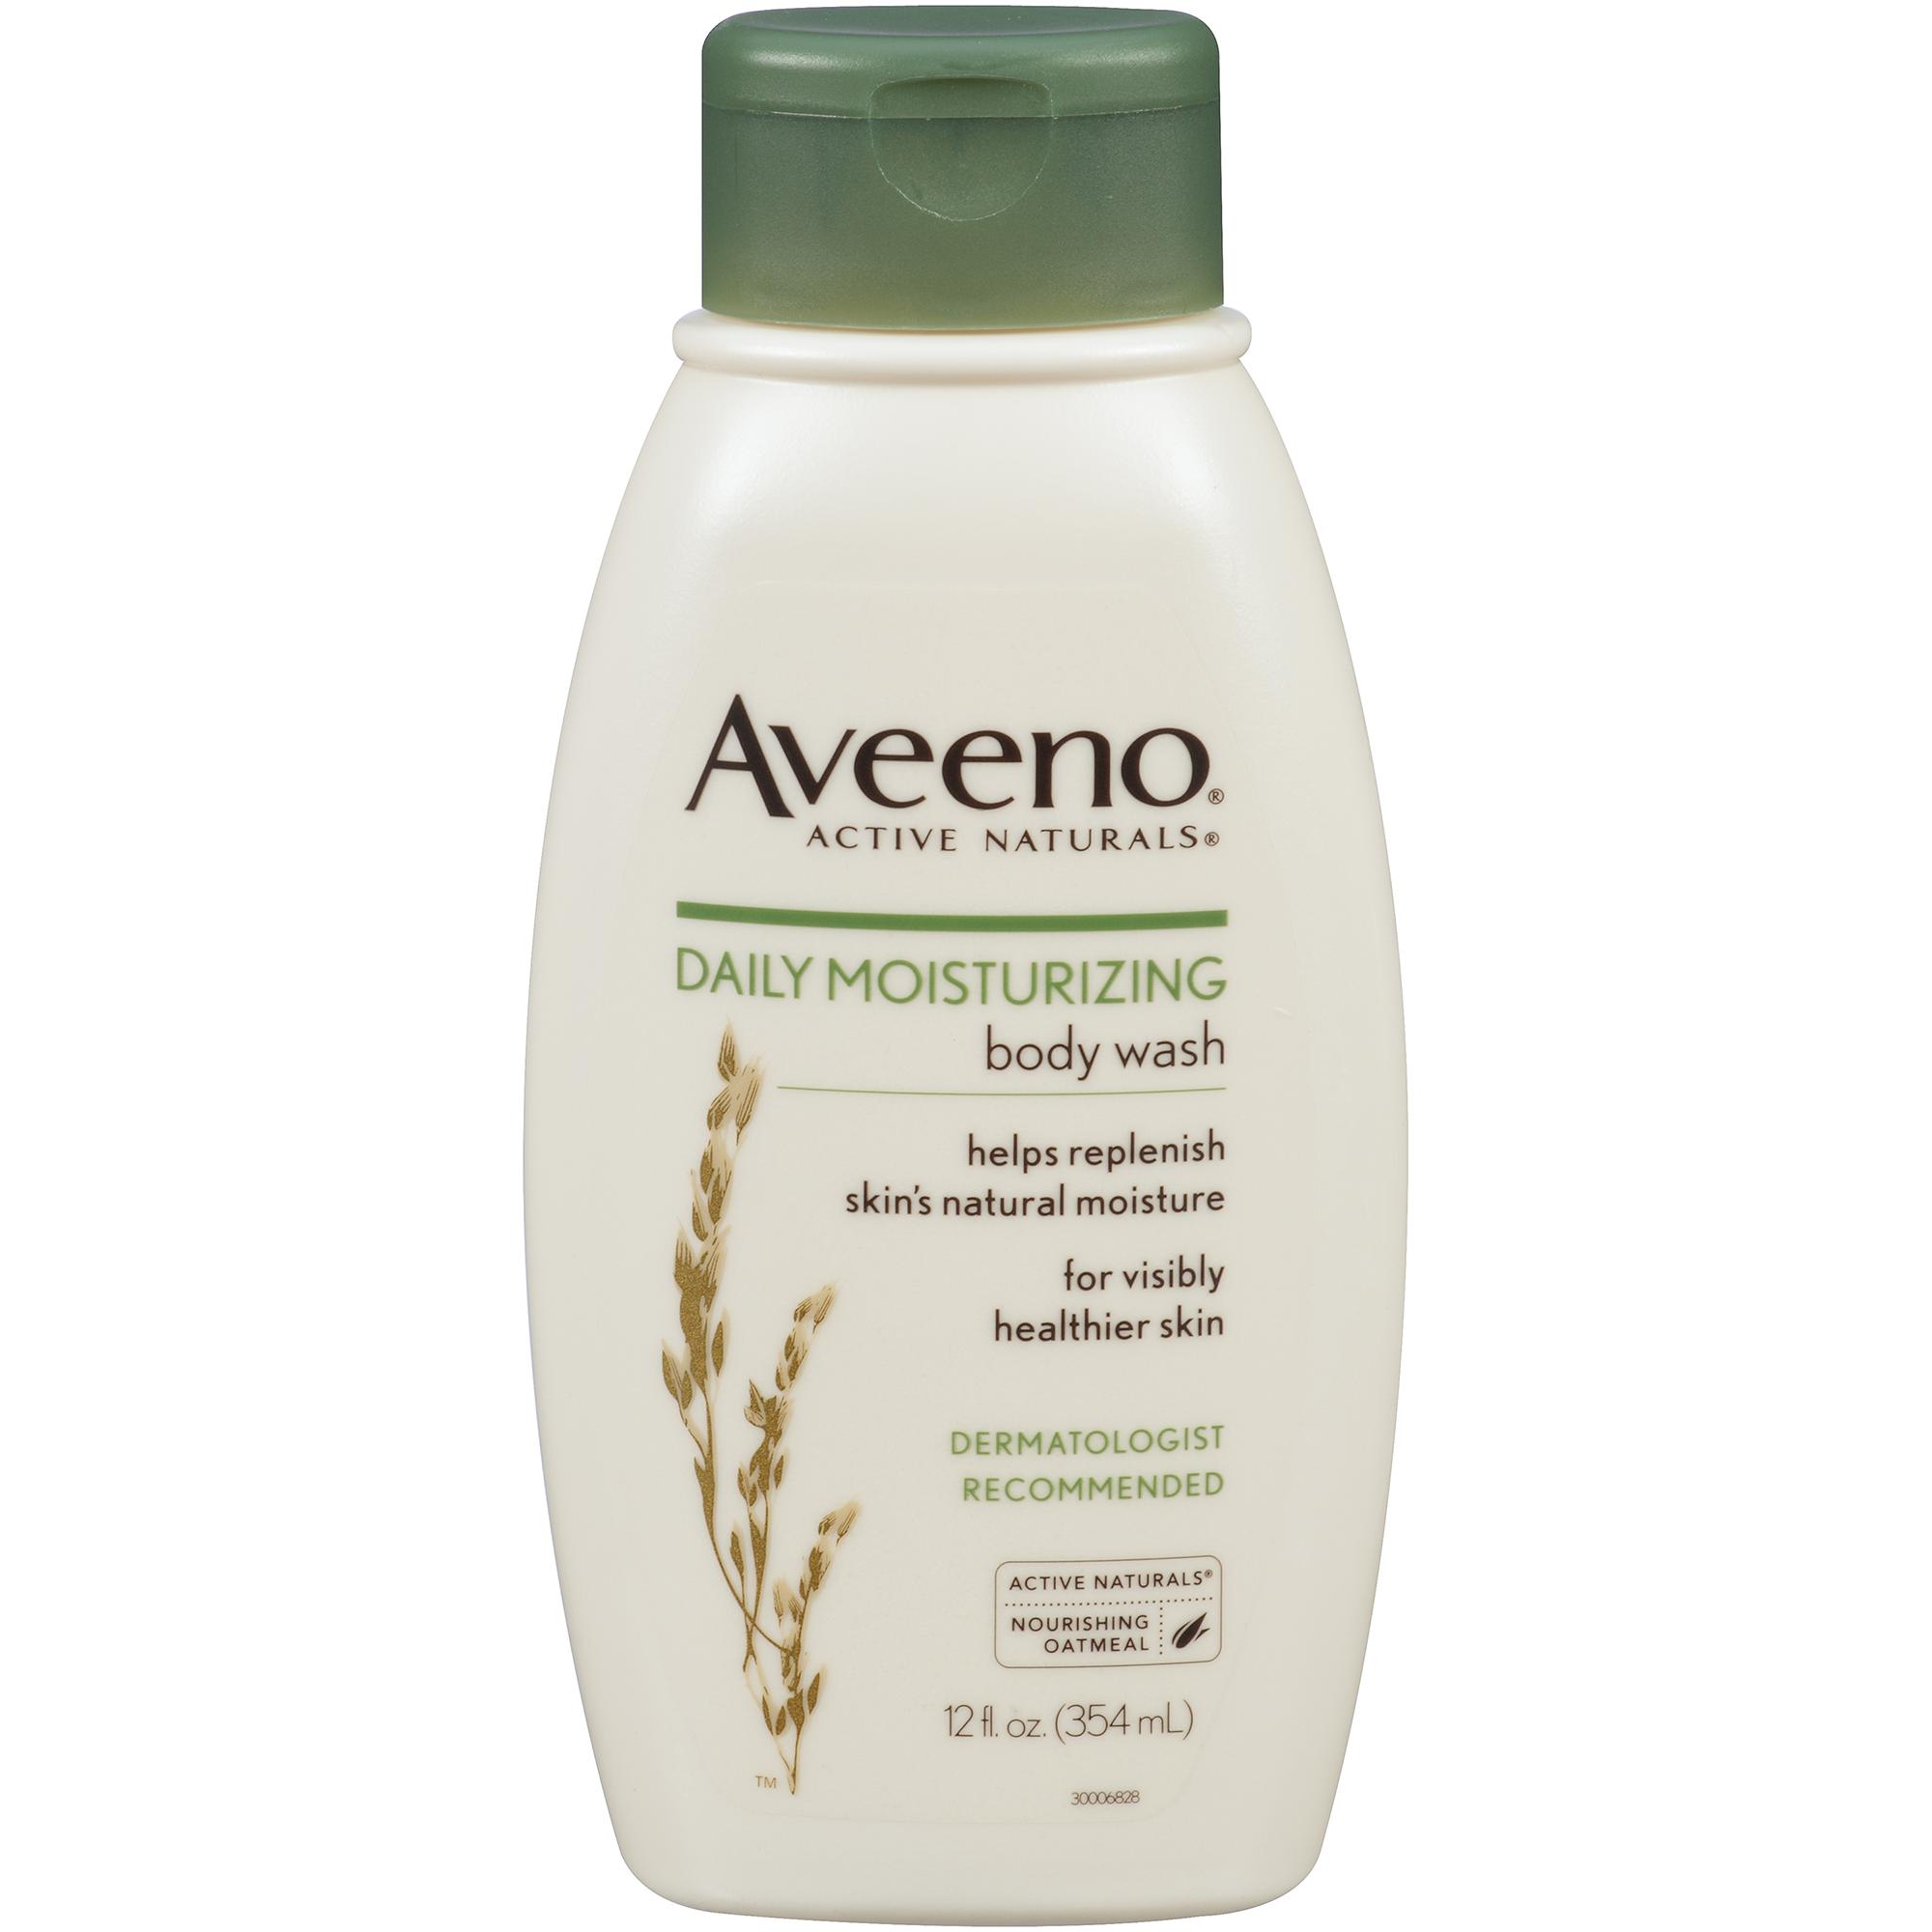 Active Naturals Skin Care Brand